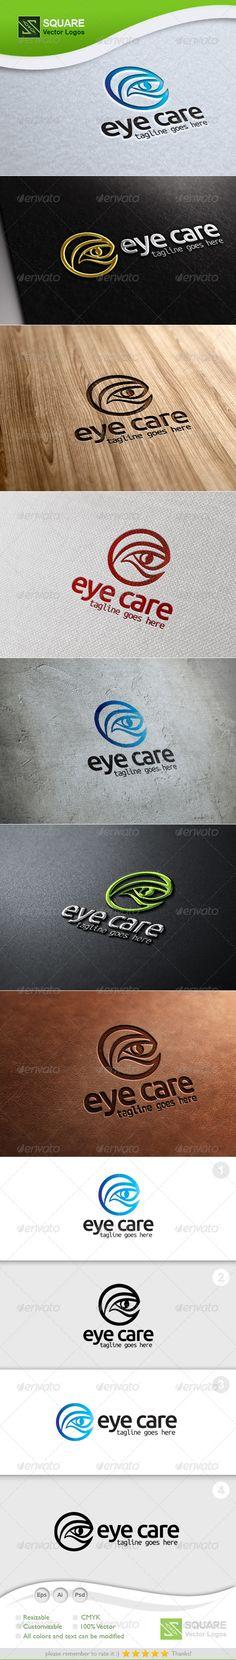 E, Eye Vector Logo Template — Photoshop PSD #diseases #defense • Available here → https://graphicriver.net/item/e-eye-vector-logo-template/5491947?ref=pxcr